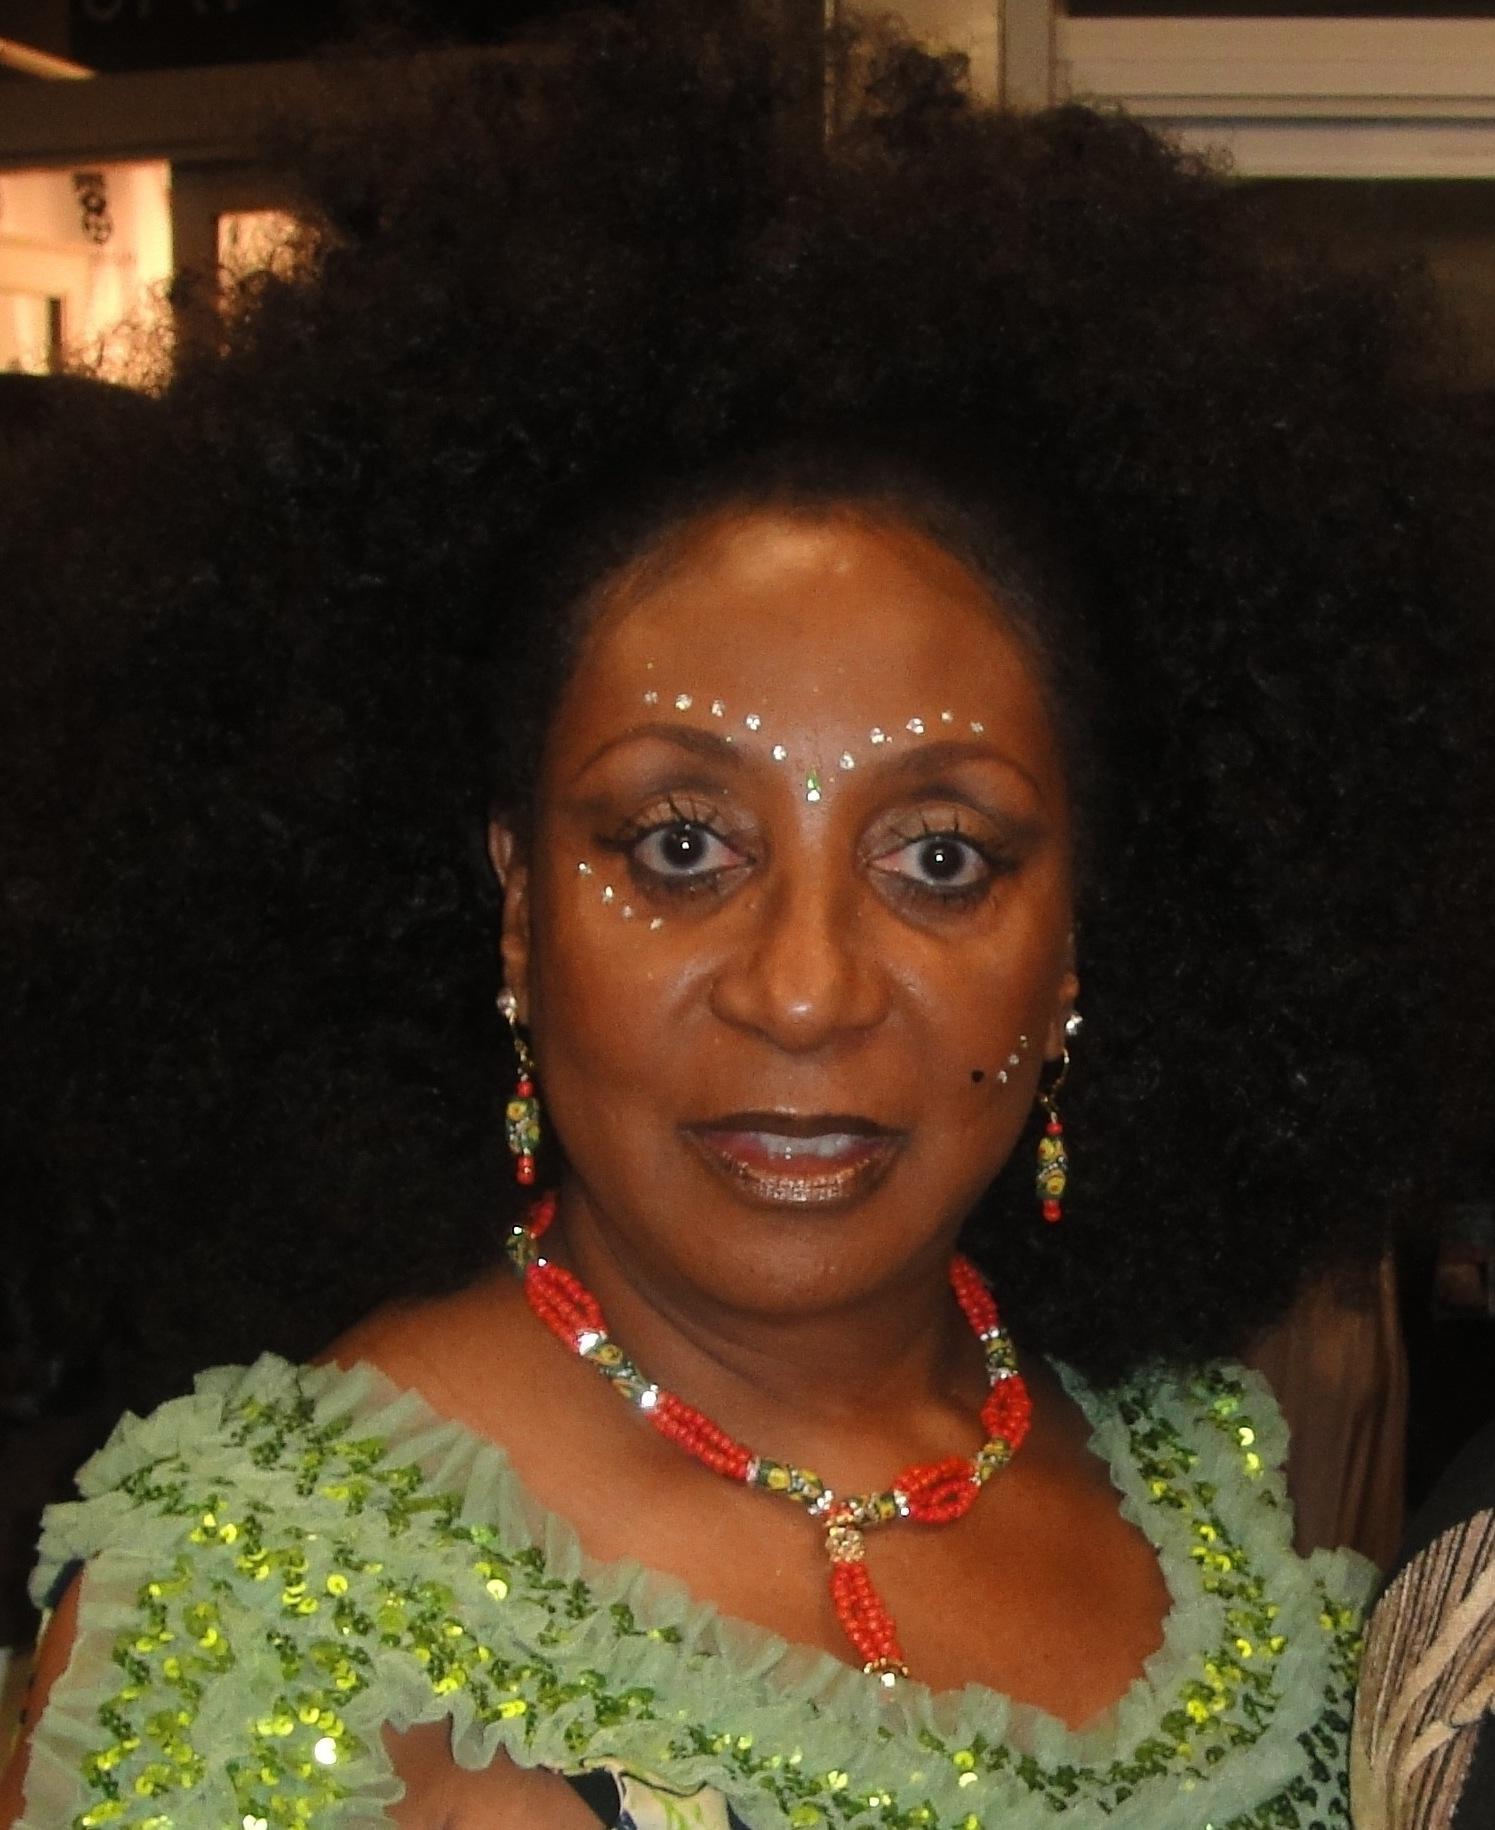 Music revolutionary Sandra Izsadore